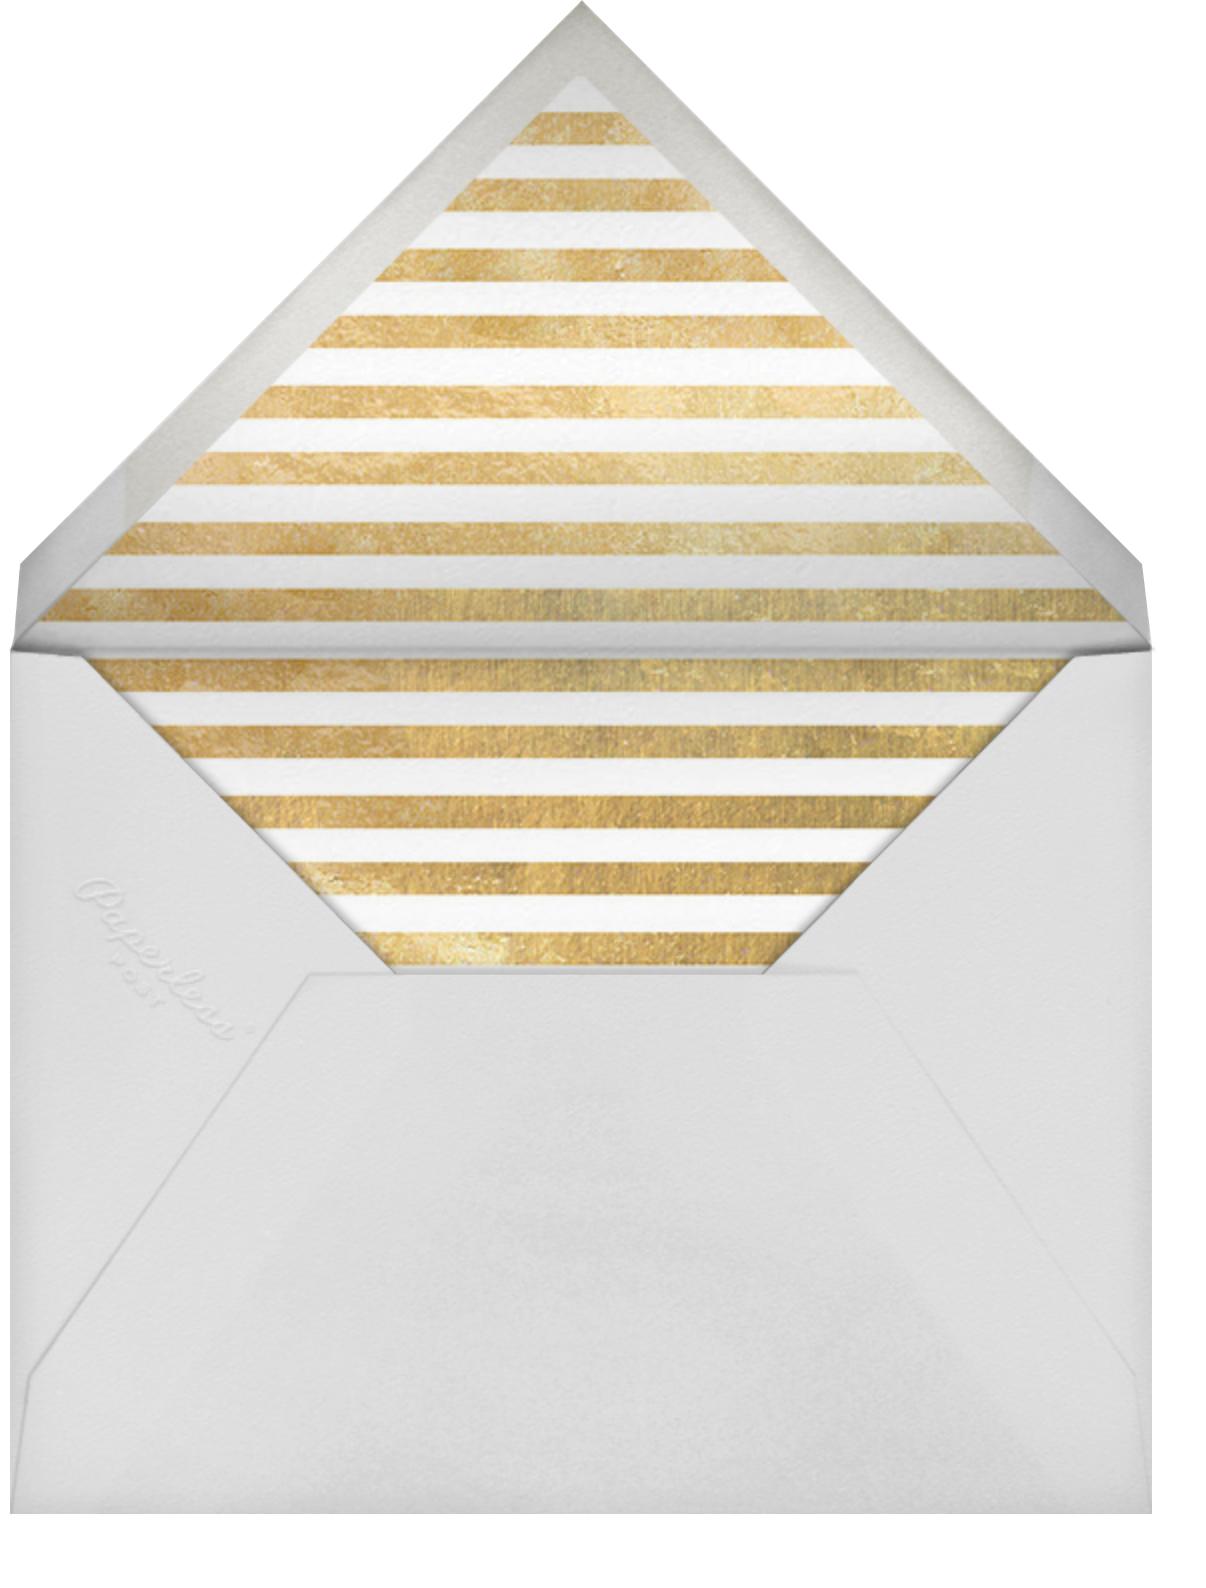 Confetti - Aqua/Gold - kate spade new york - Bat and bar mitzvah - envelope back